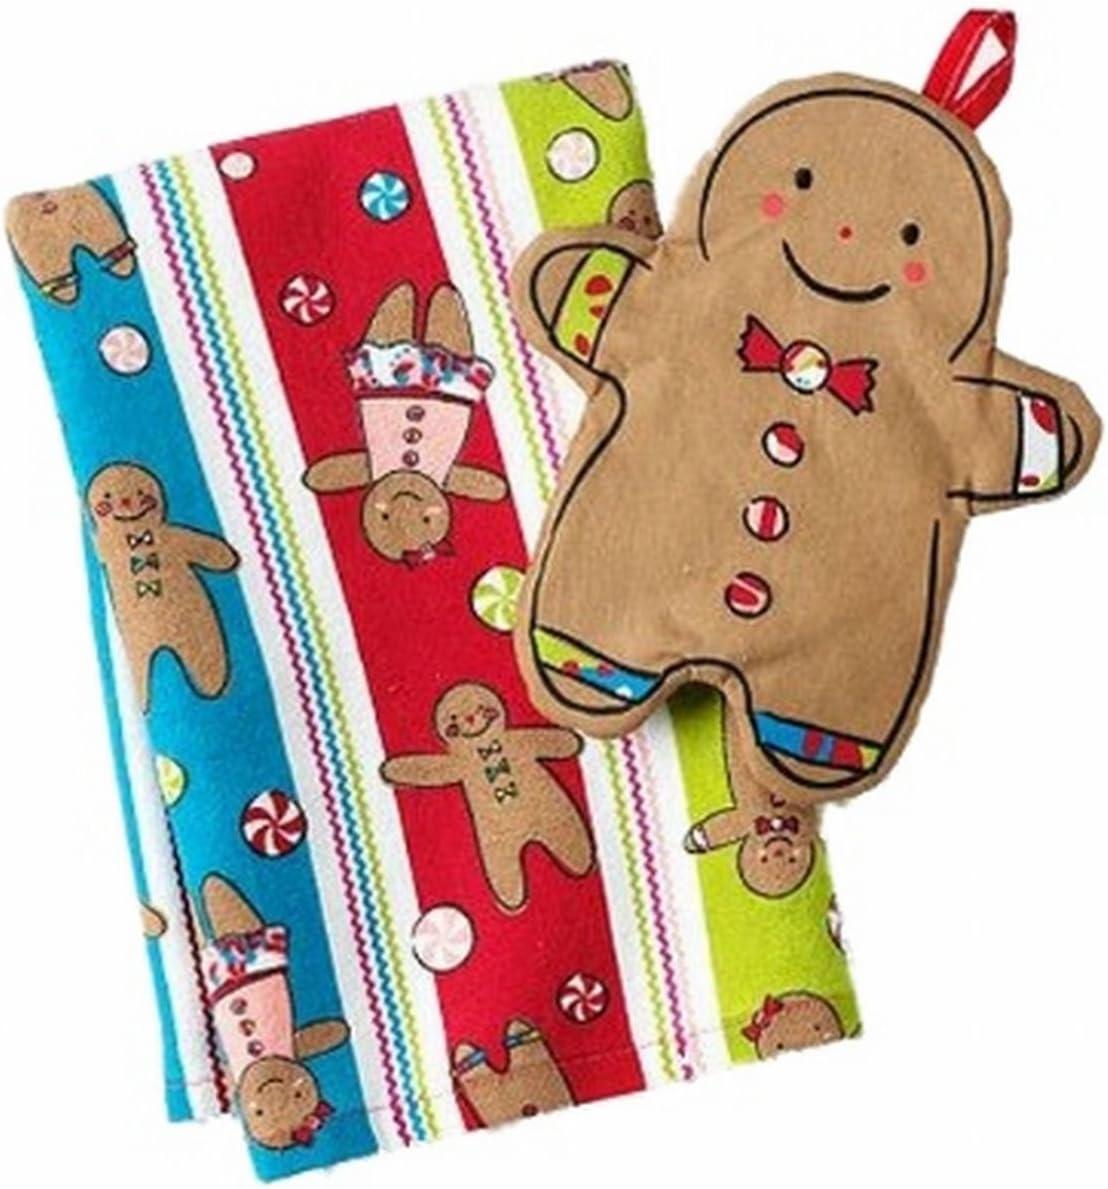 Gingerbread Man Oh Snap Pot Holder set of 2